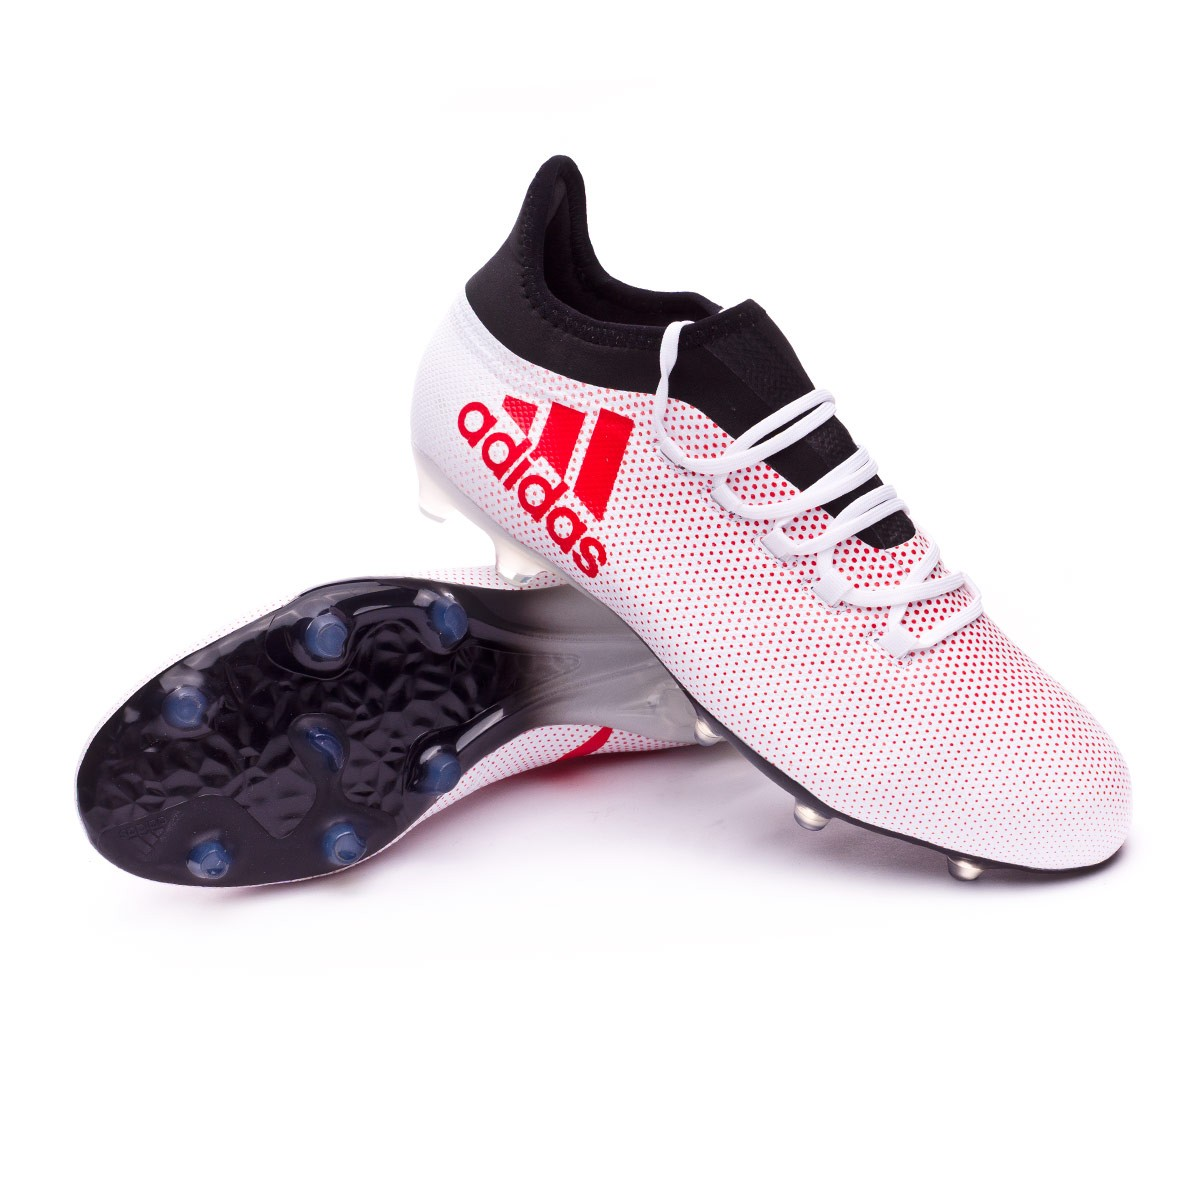 4ddec0601105 adidas X 17.2 FG Football Boots. Grey-Real coral-Core black ...